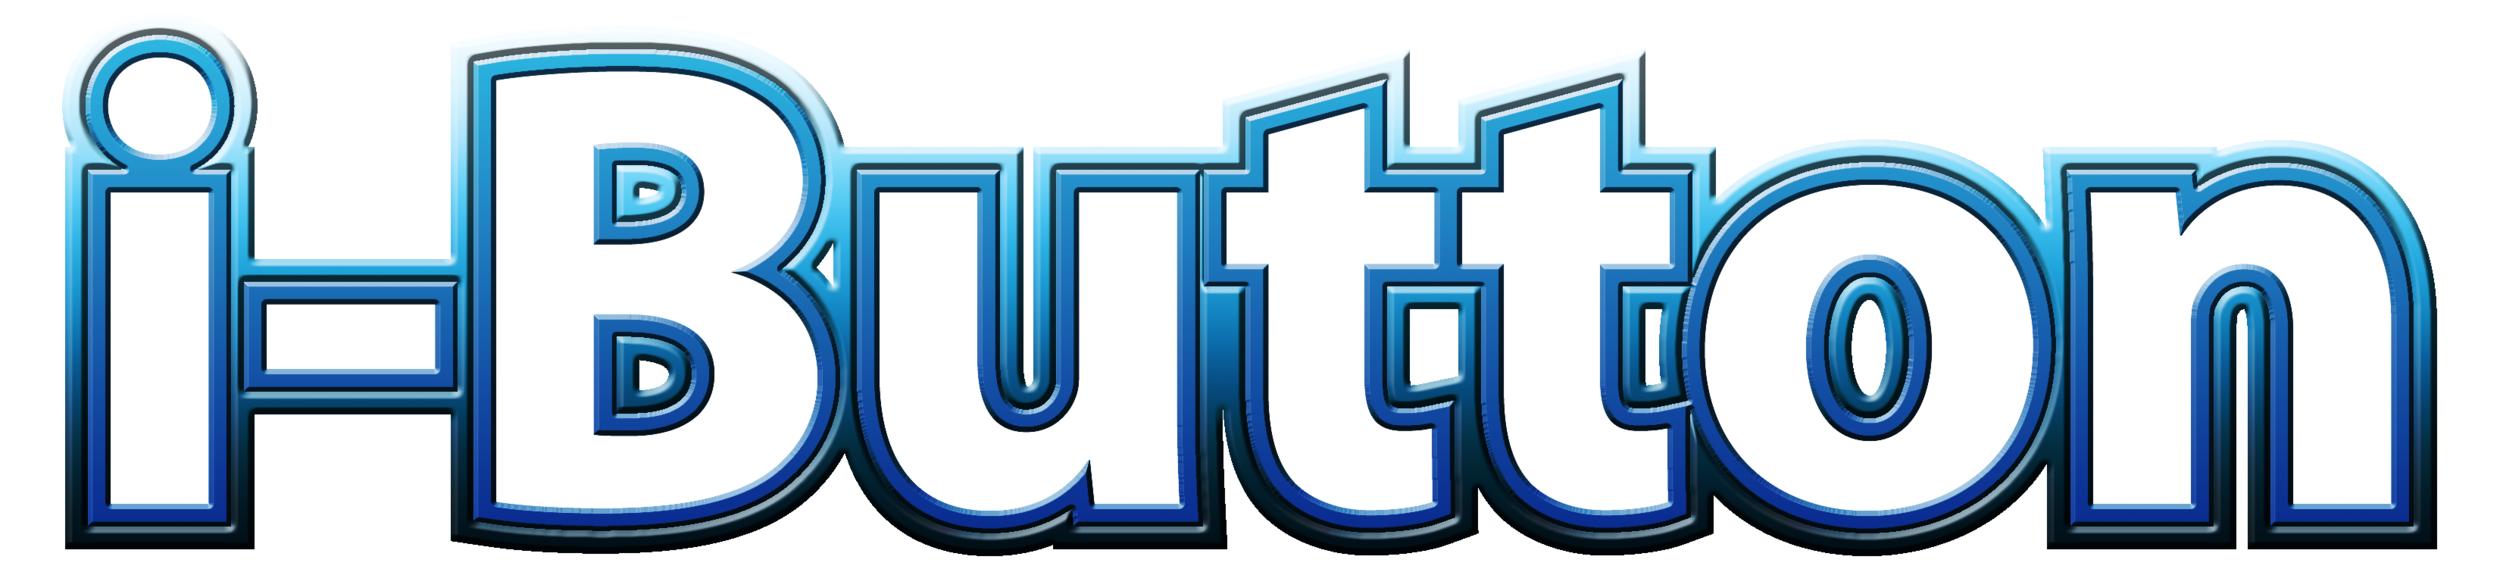 ibutton logo 3d-large.png